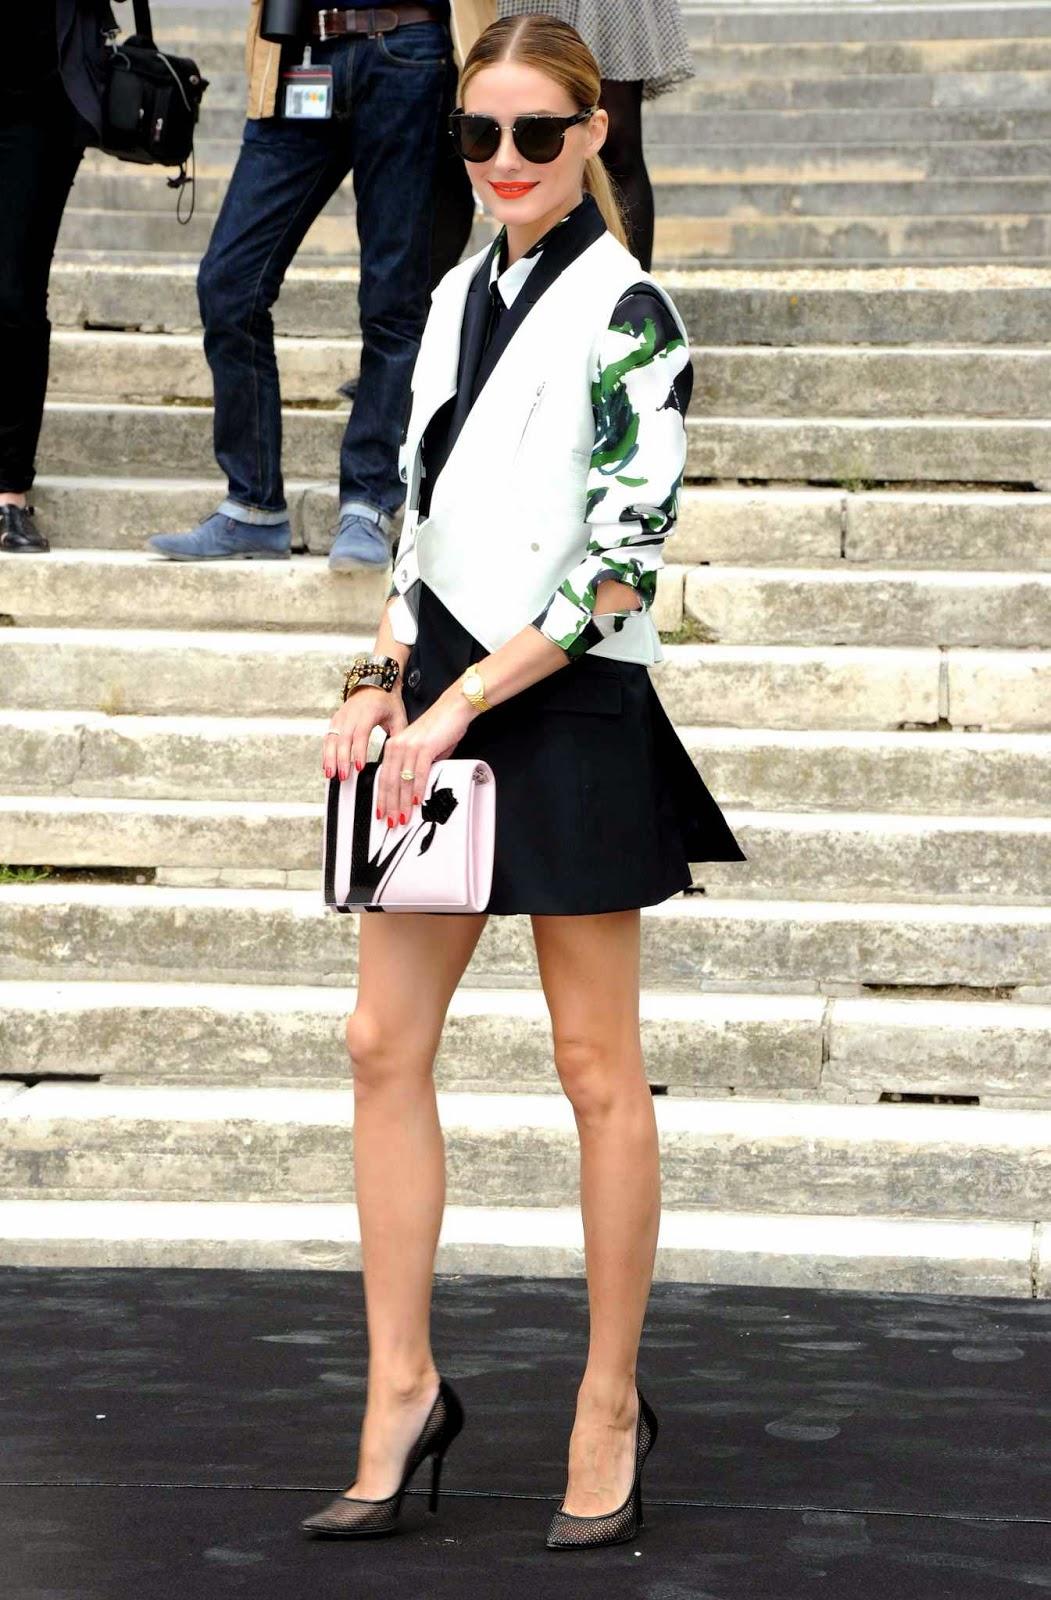 The Olivia Palermo Lookbook : Olivia Palermo At the ...